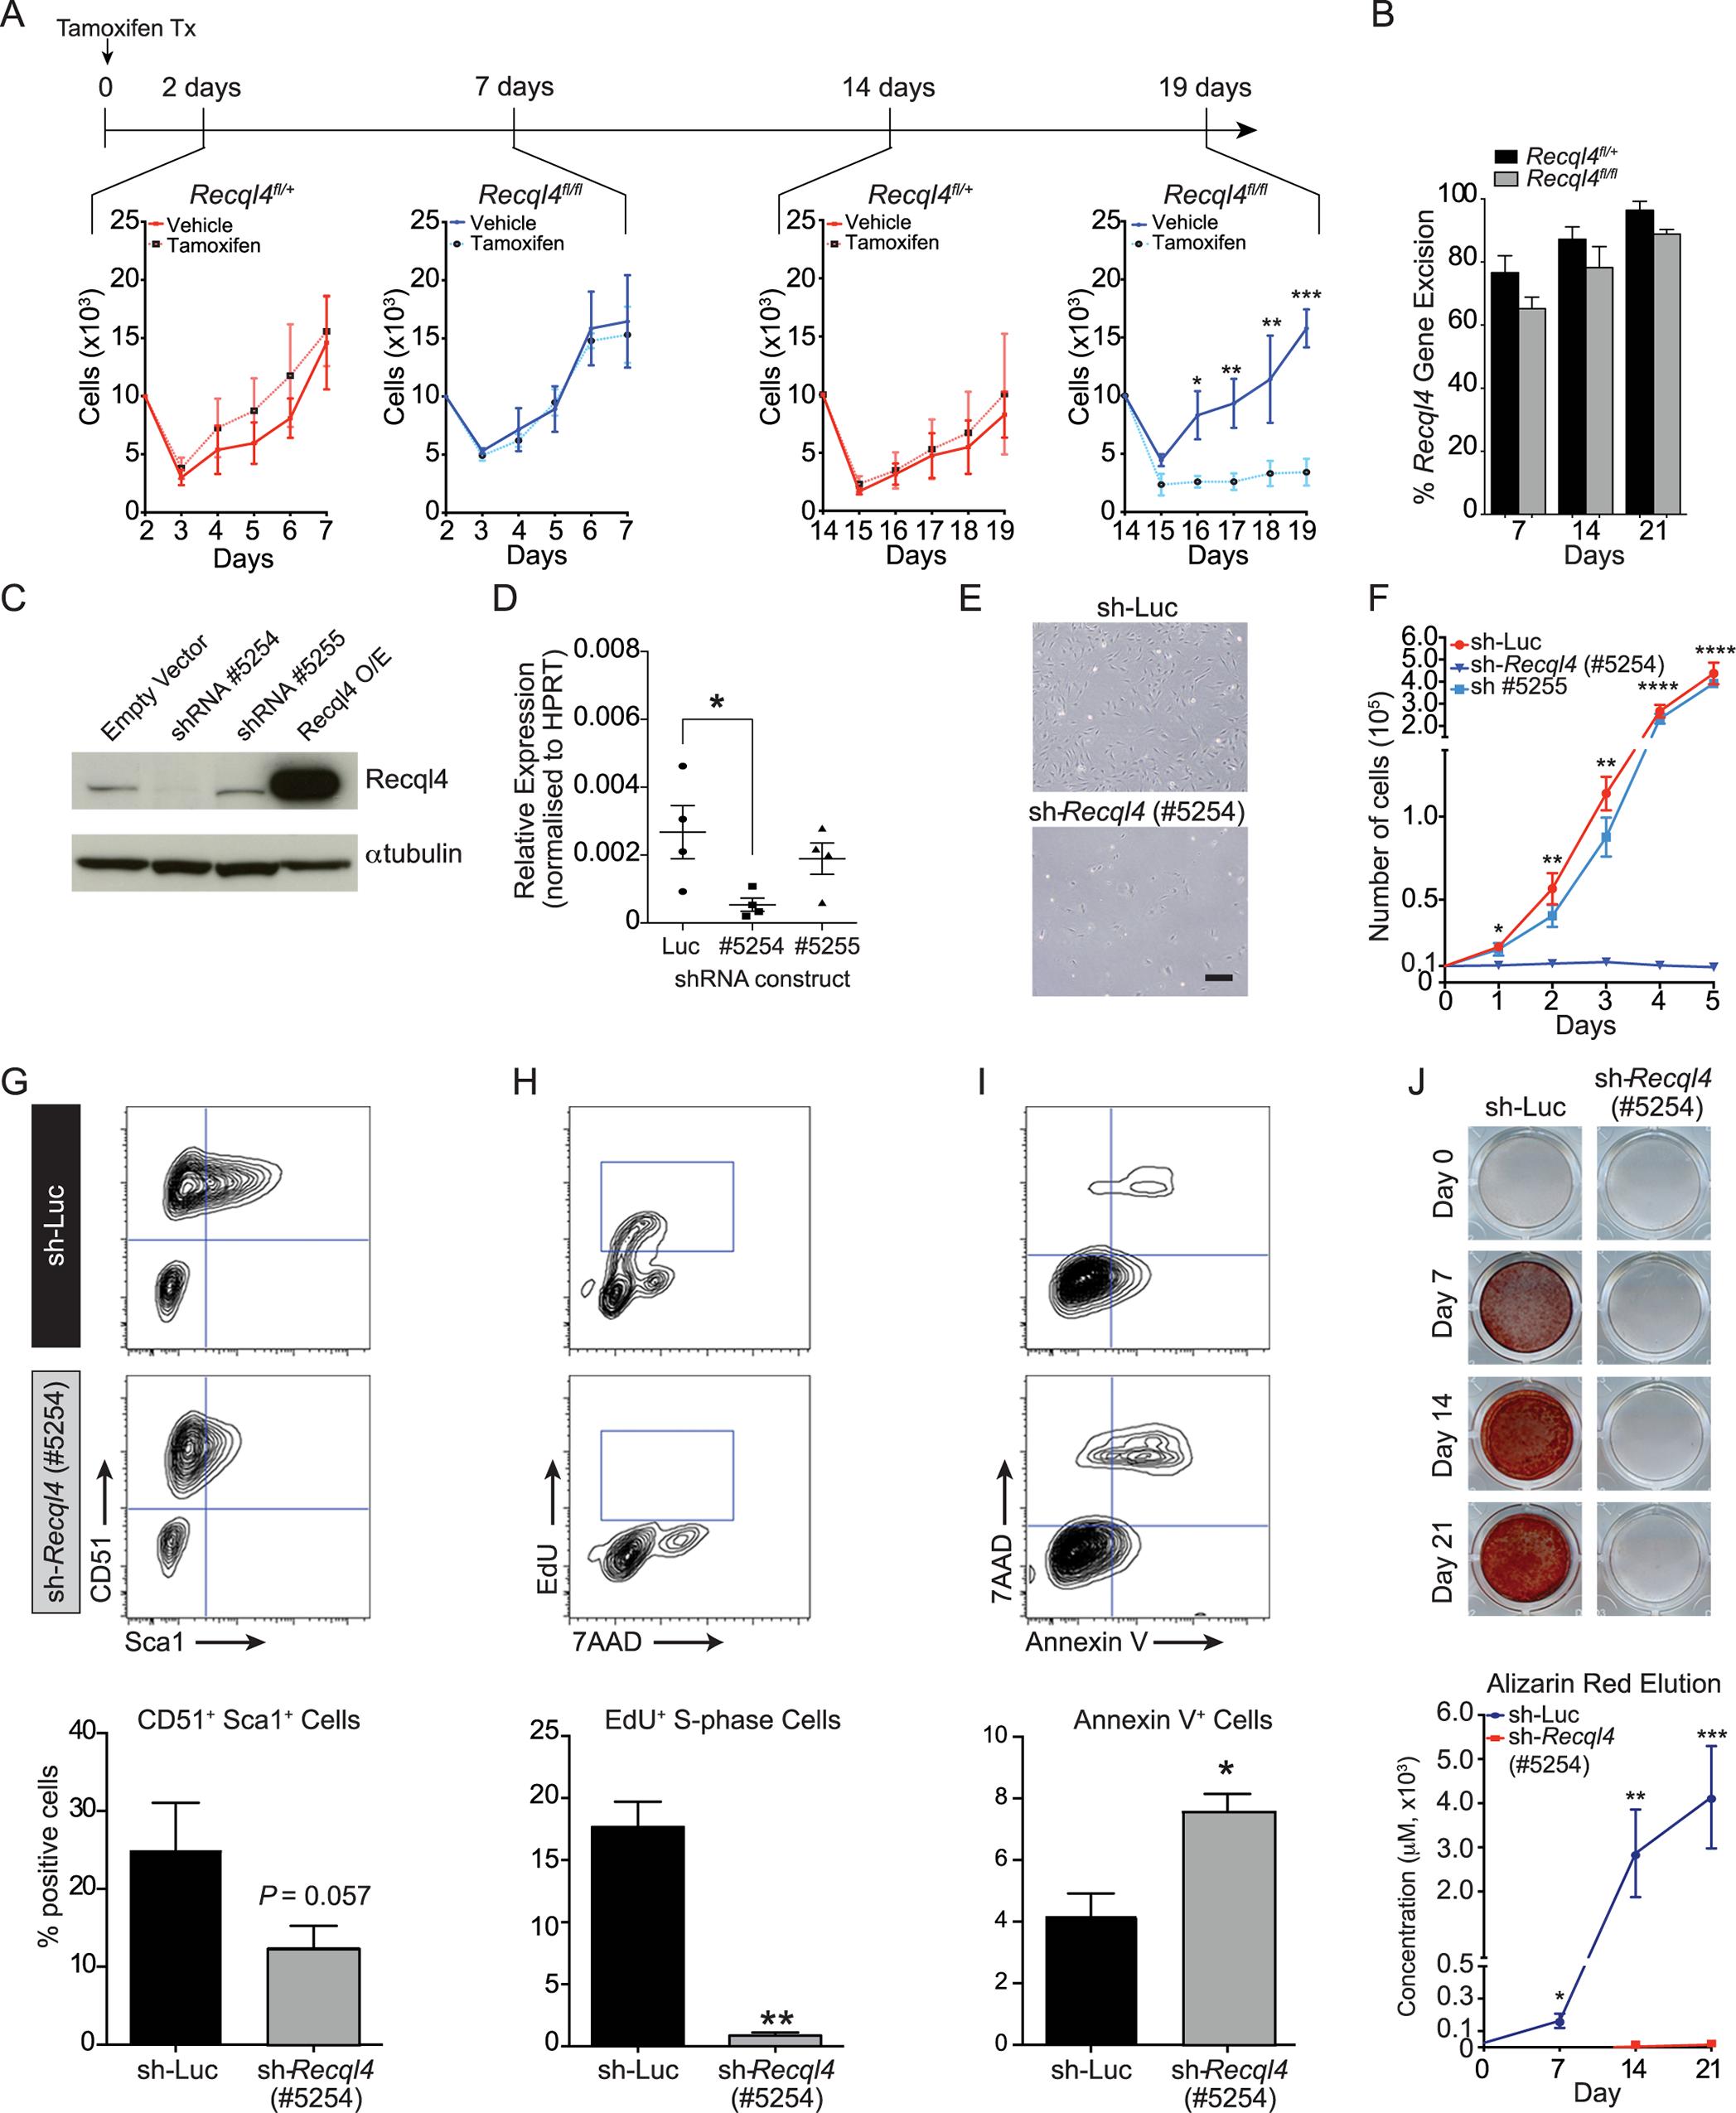 The depletion of <i>Recql4 in vitro</i> causes proliferation arrest.